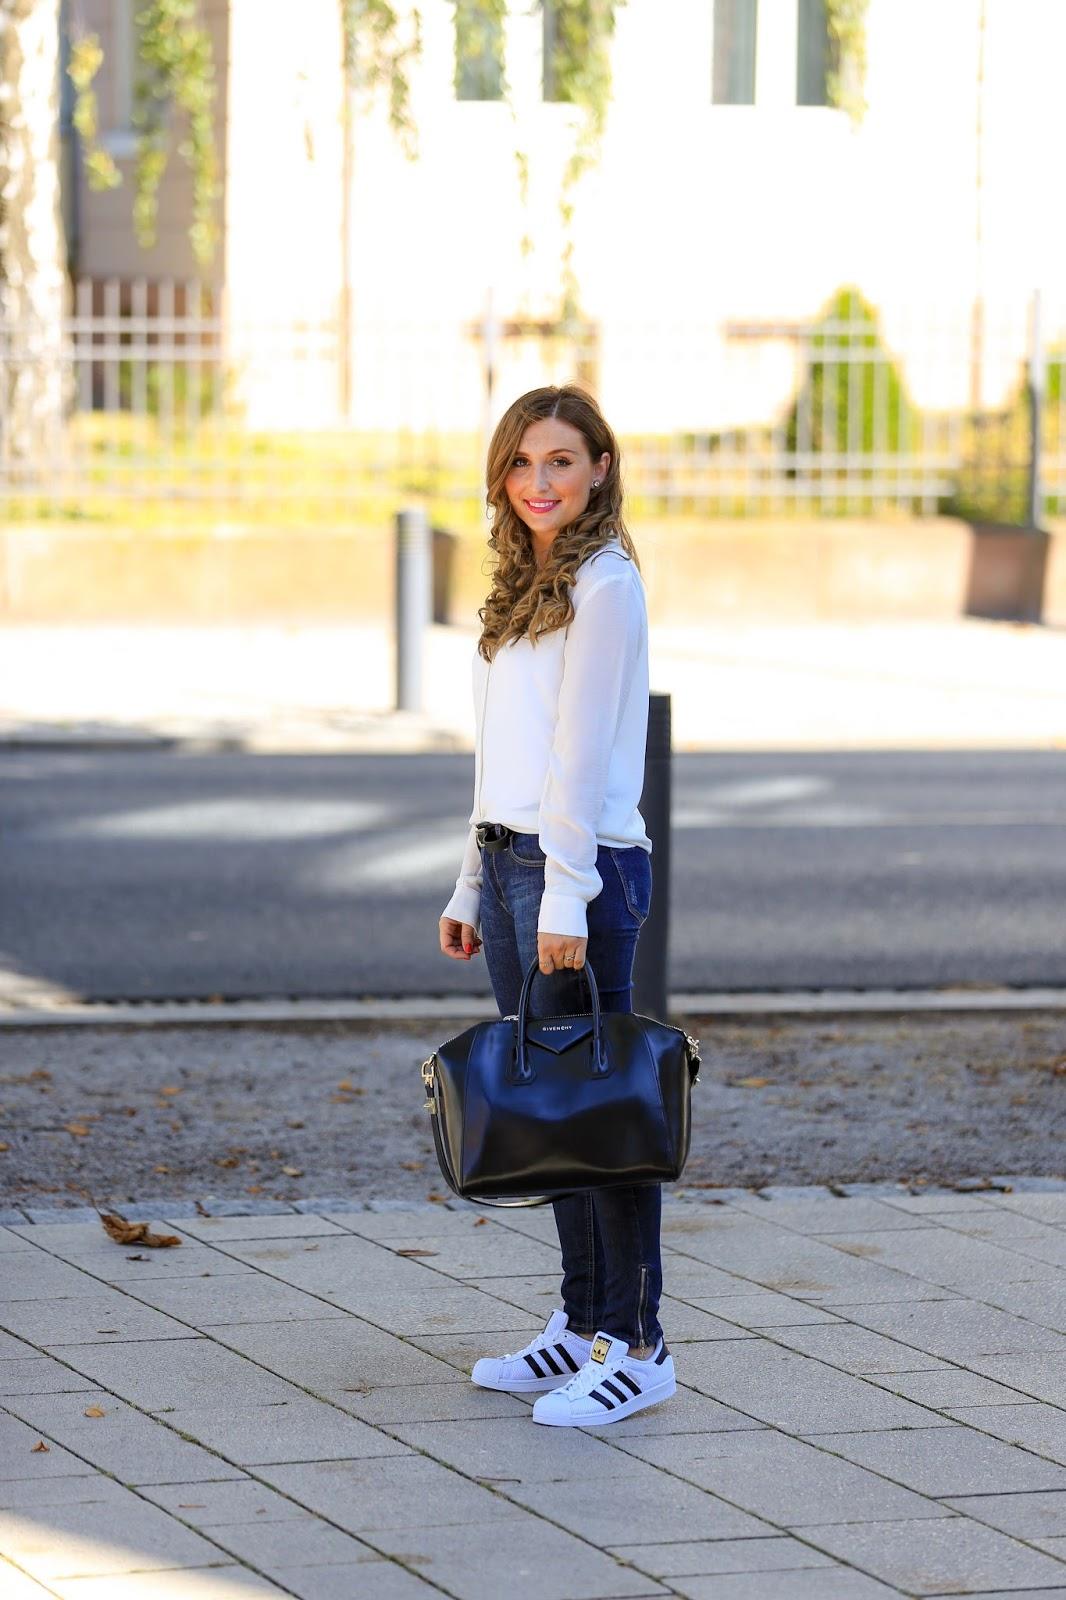 Streetstylelook - Fashionstylebyjohanna-Blogger-Fashionblog-Outfit-Modeblog-München-deutsche-Fashionblogger-Influencer-rosa-GivenchytascheiPhone